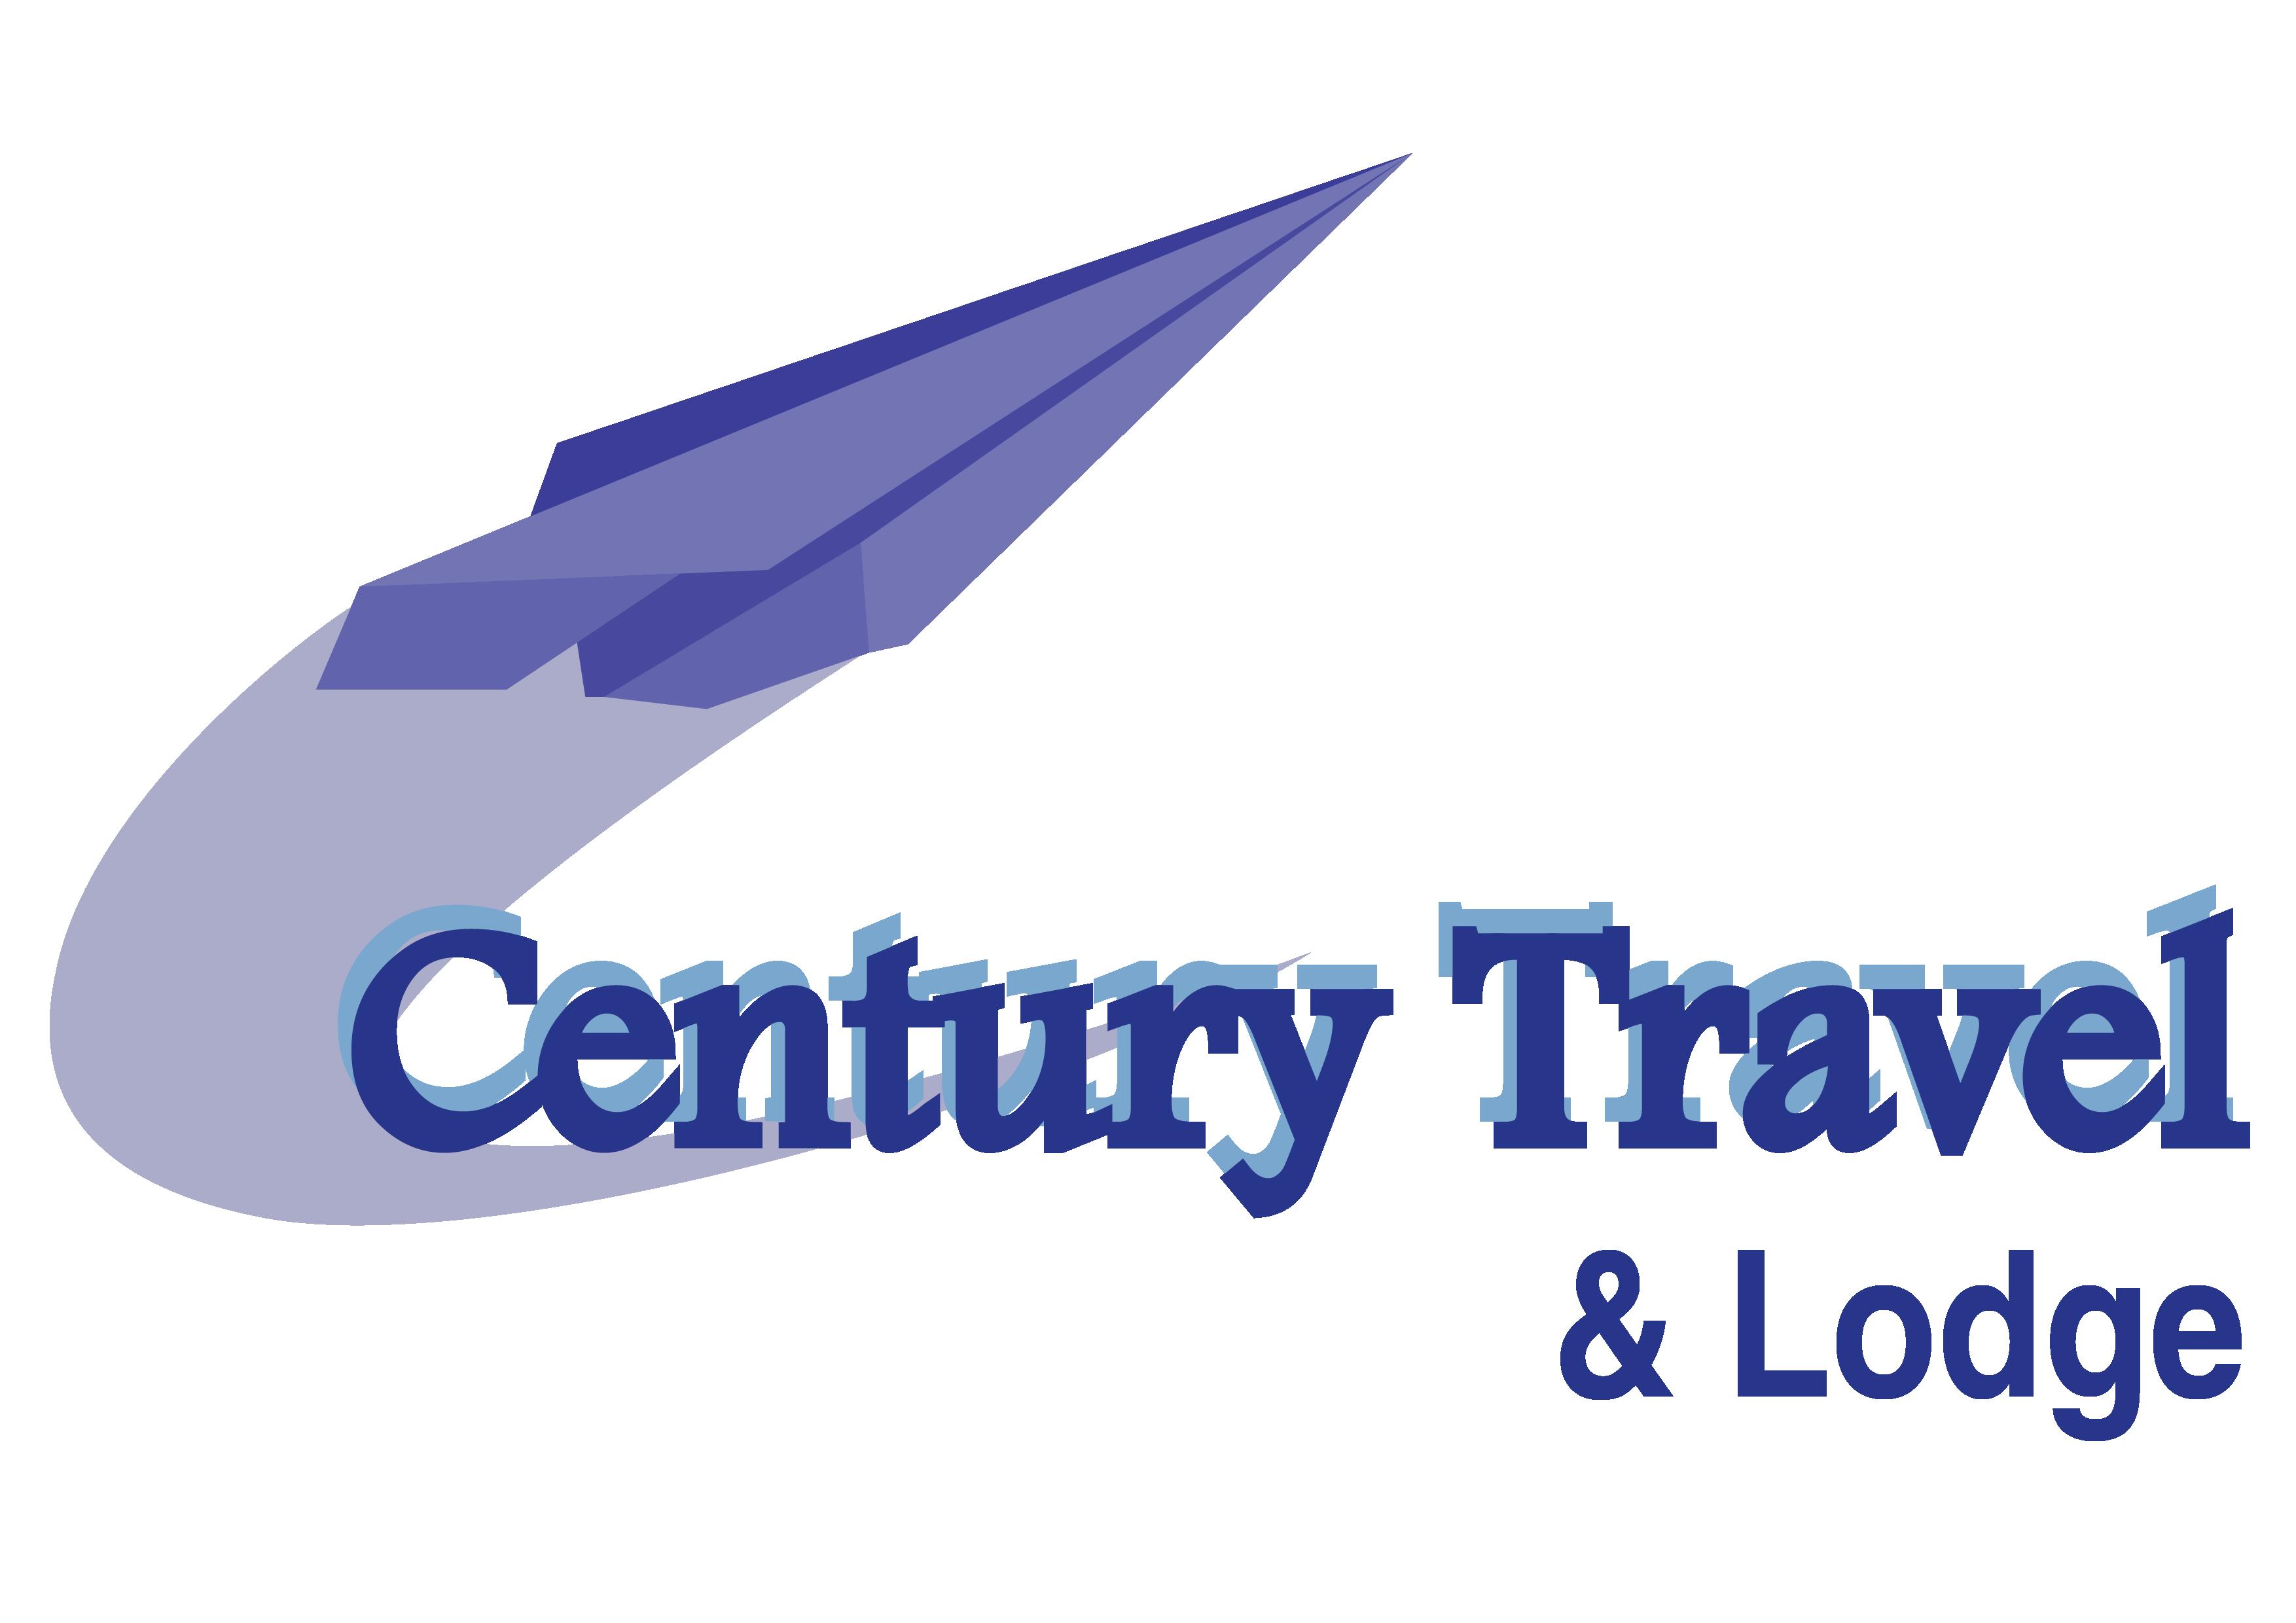 Century Travel & Lodge